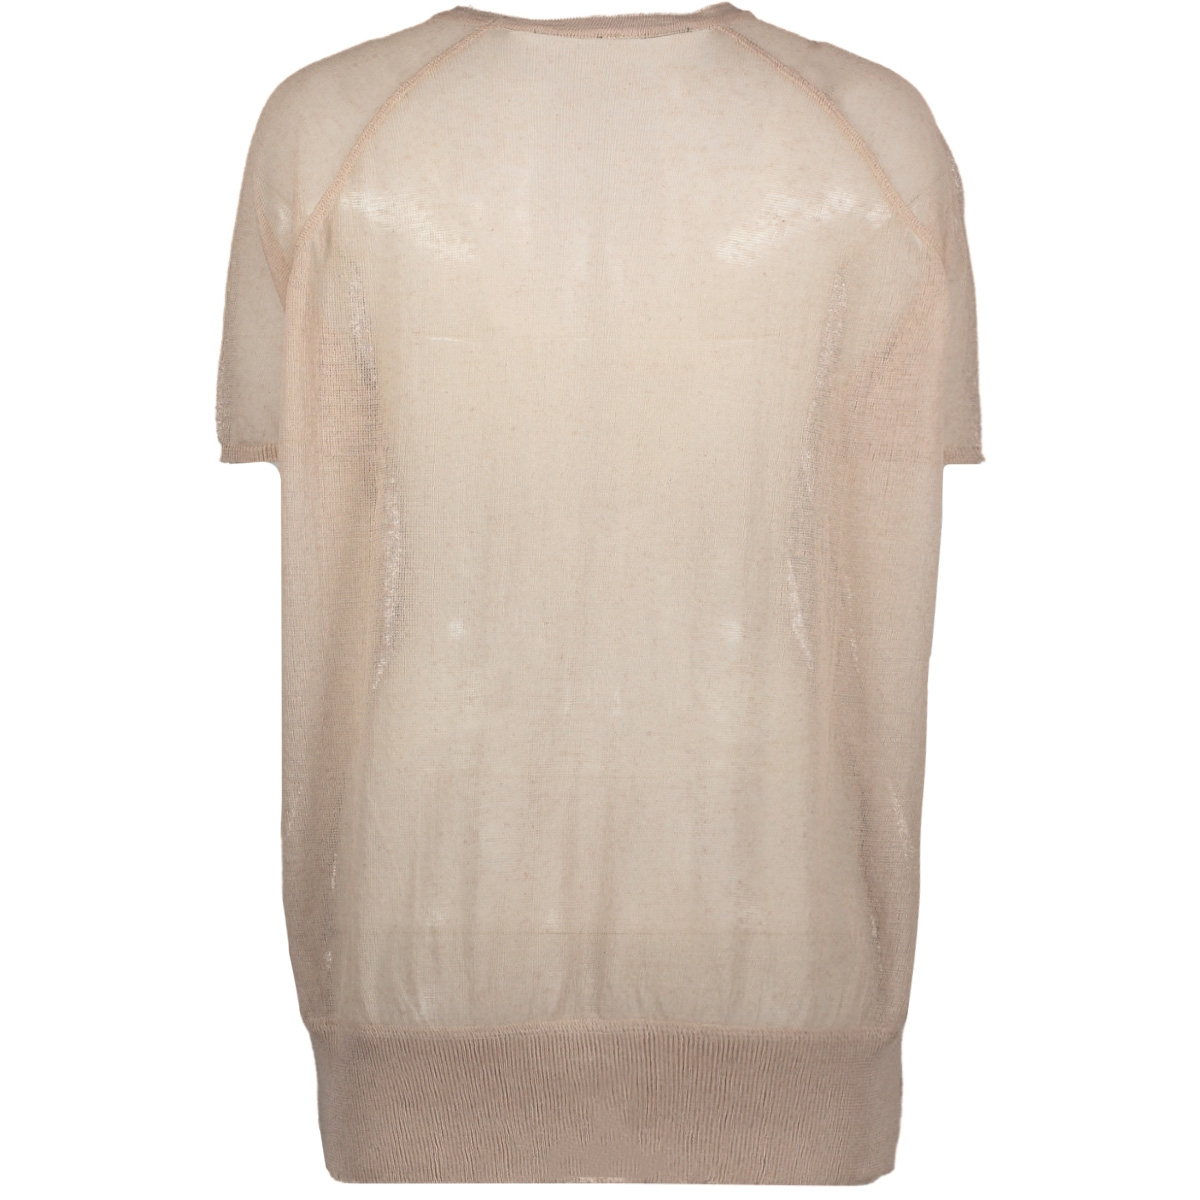 sleeveless sweater 20 616 9101 10 days t-shirt powder